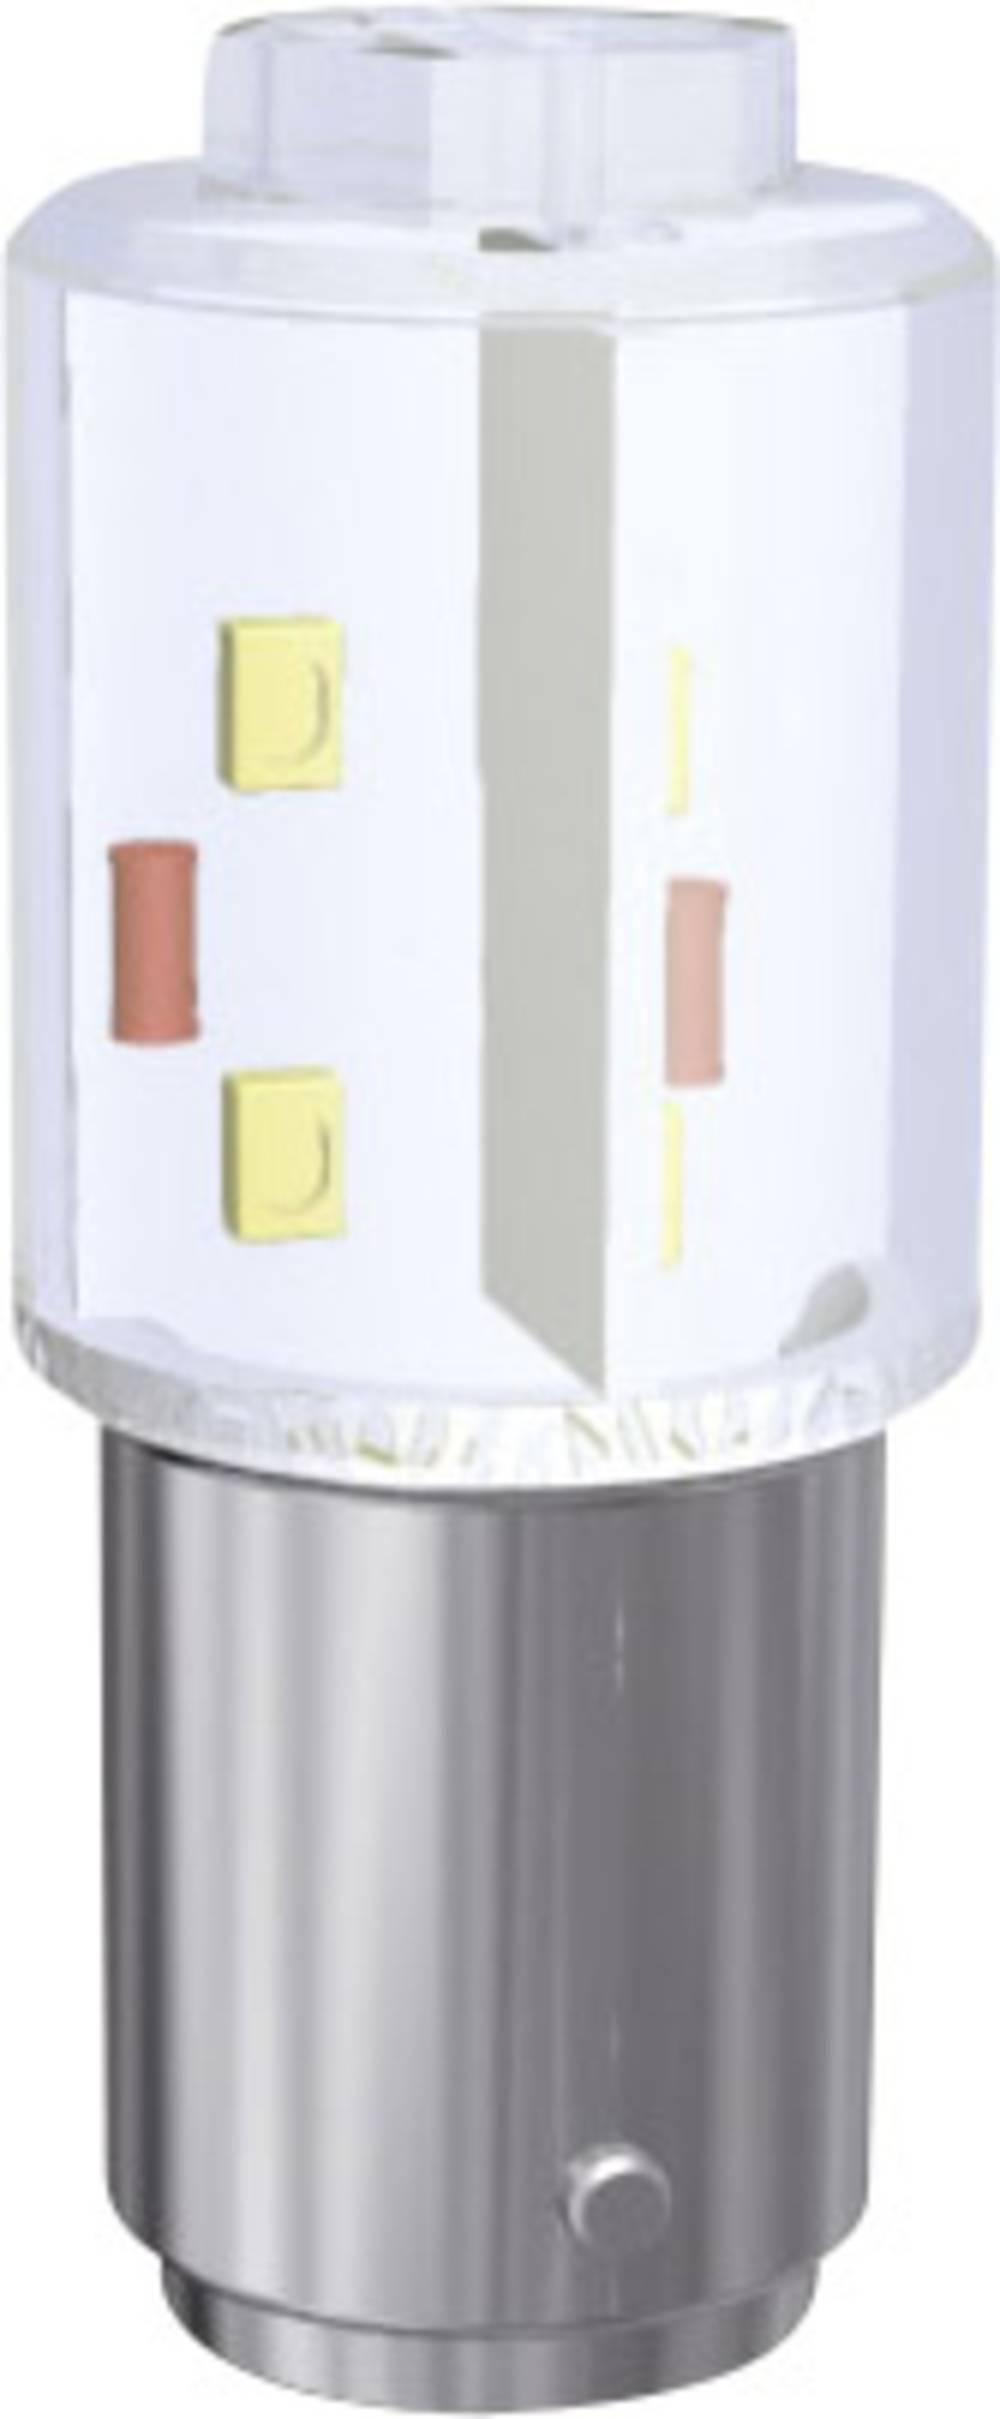 LED žarnica BA15d rumena 24 V/DC, 24 V/AC 2200 mlm Signal Construct MBRD151614